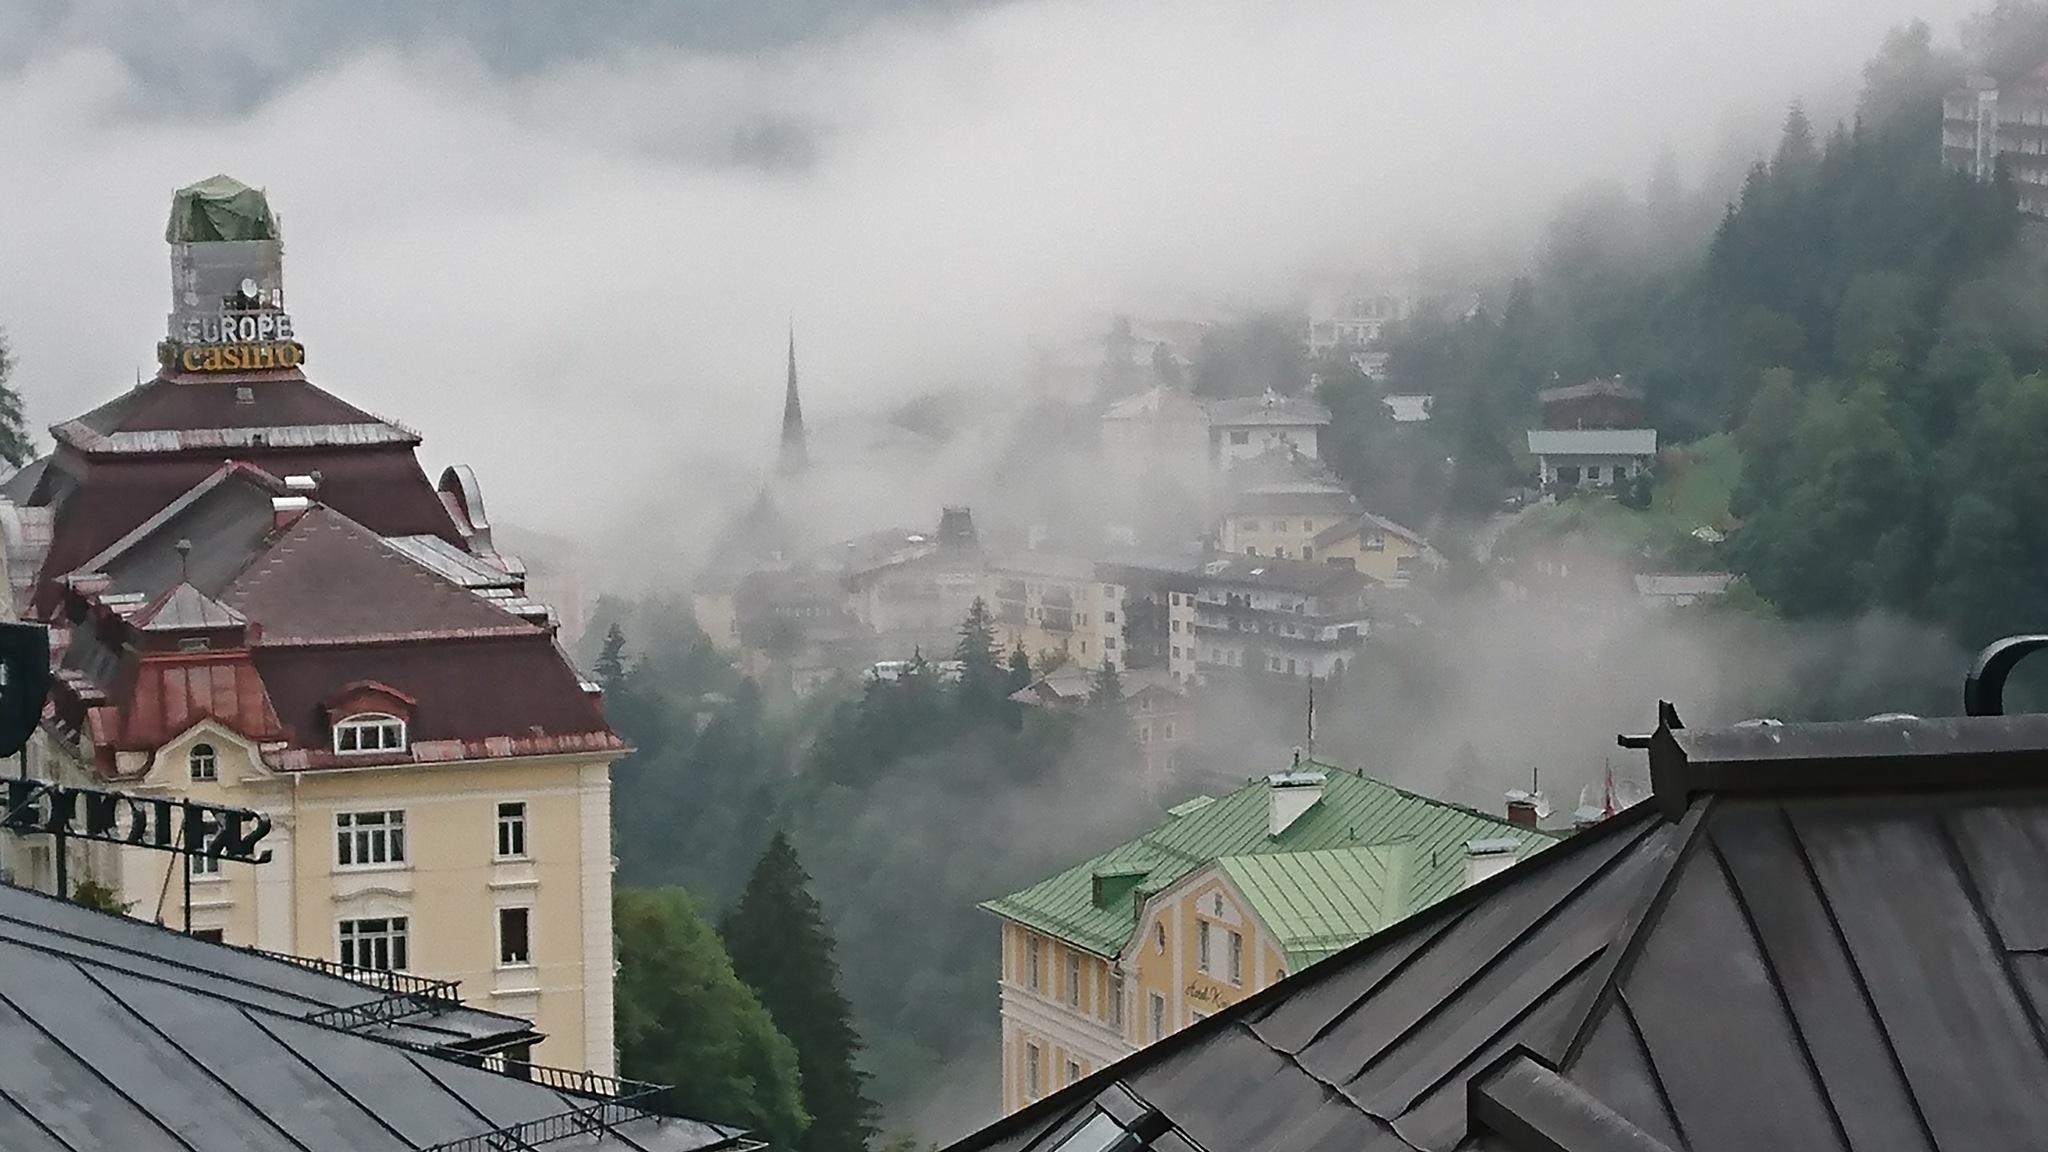 Bad Gastein in the clouds by Krister Honkonen